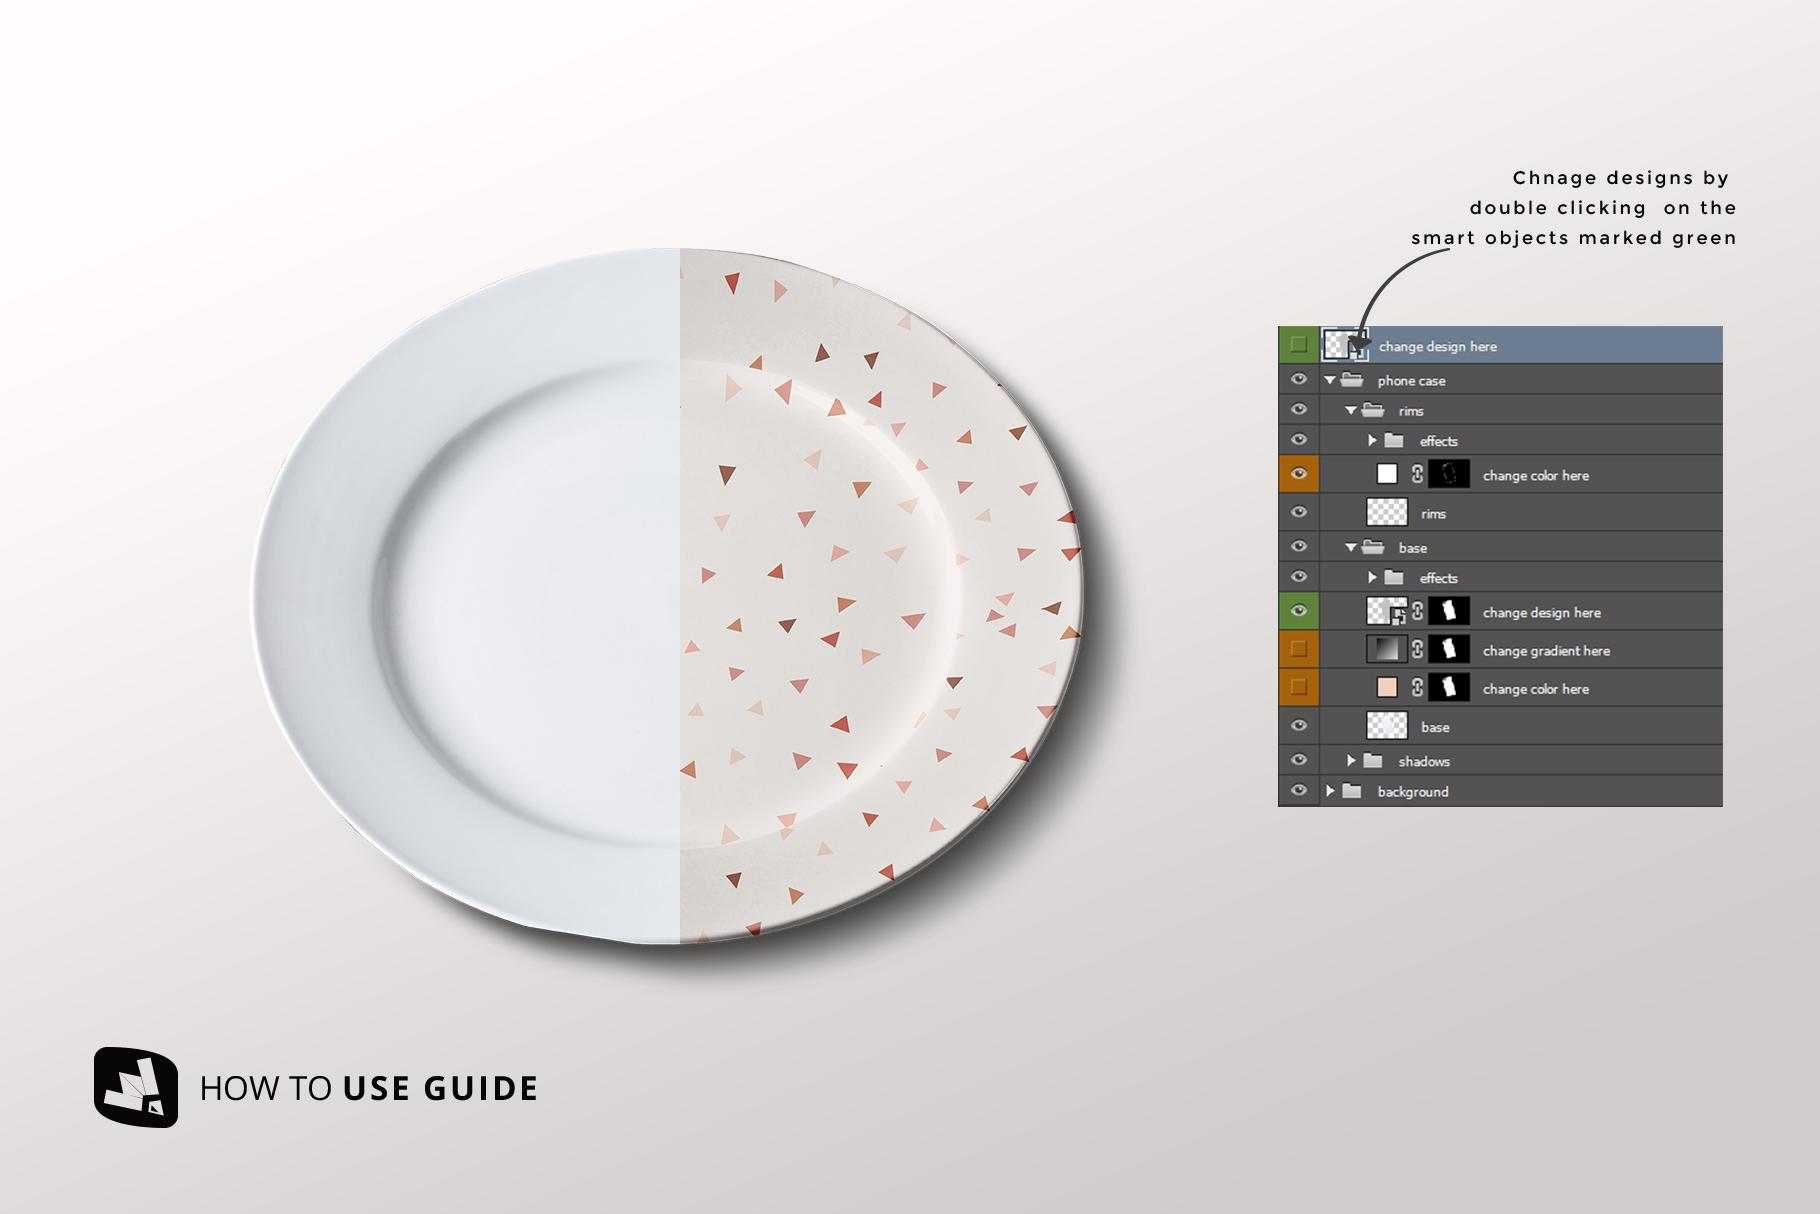 how to change design of the porcelain dinner plate mockup